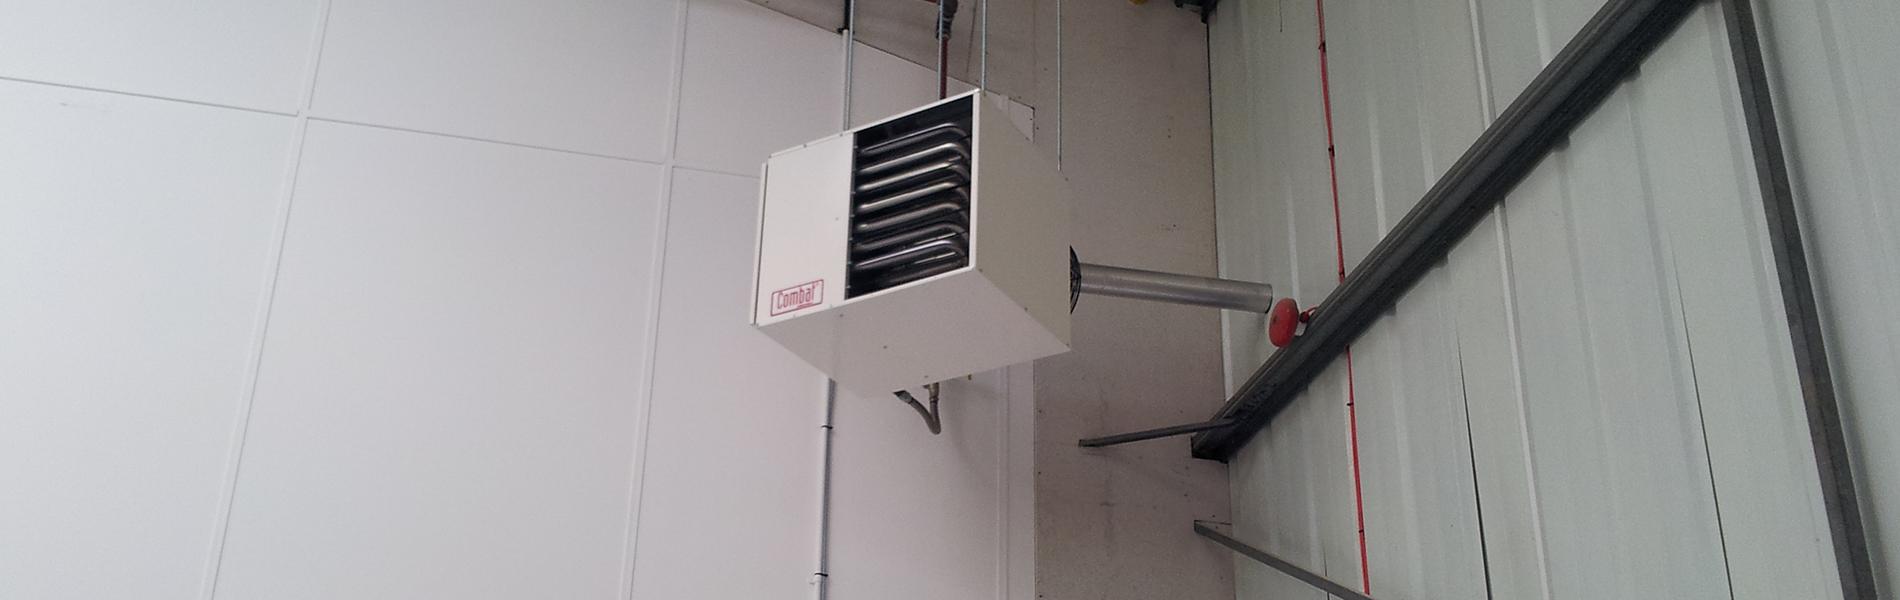 Warm Air Heating Vs Radiant Heating Heaters Wholesale